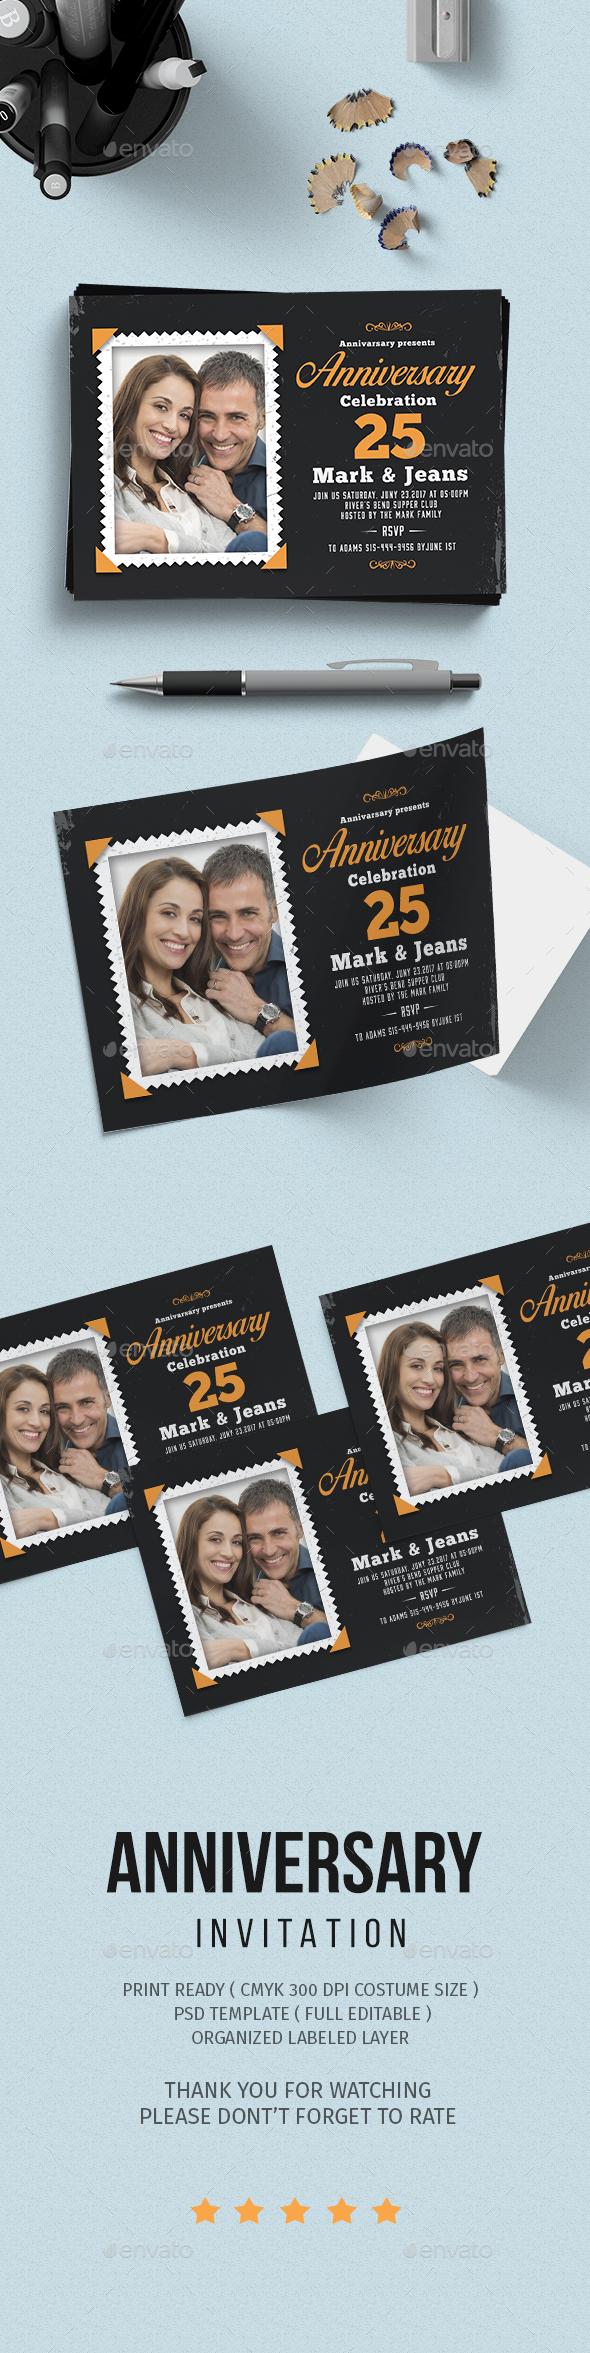 Anniversary Invitation - Invitations Cards & Invites